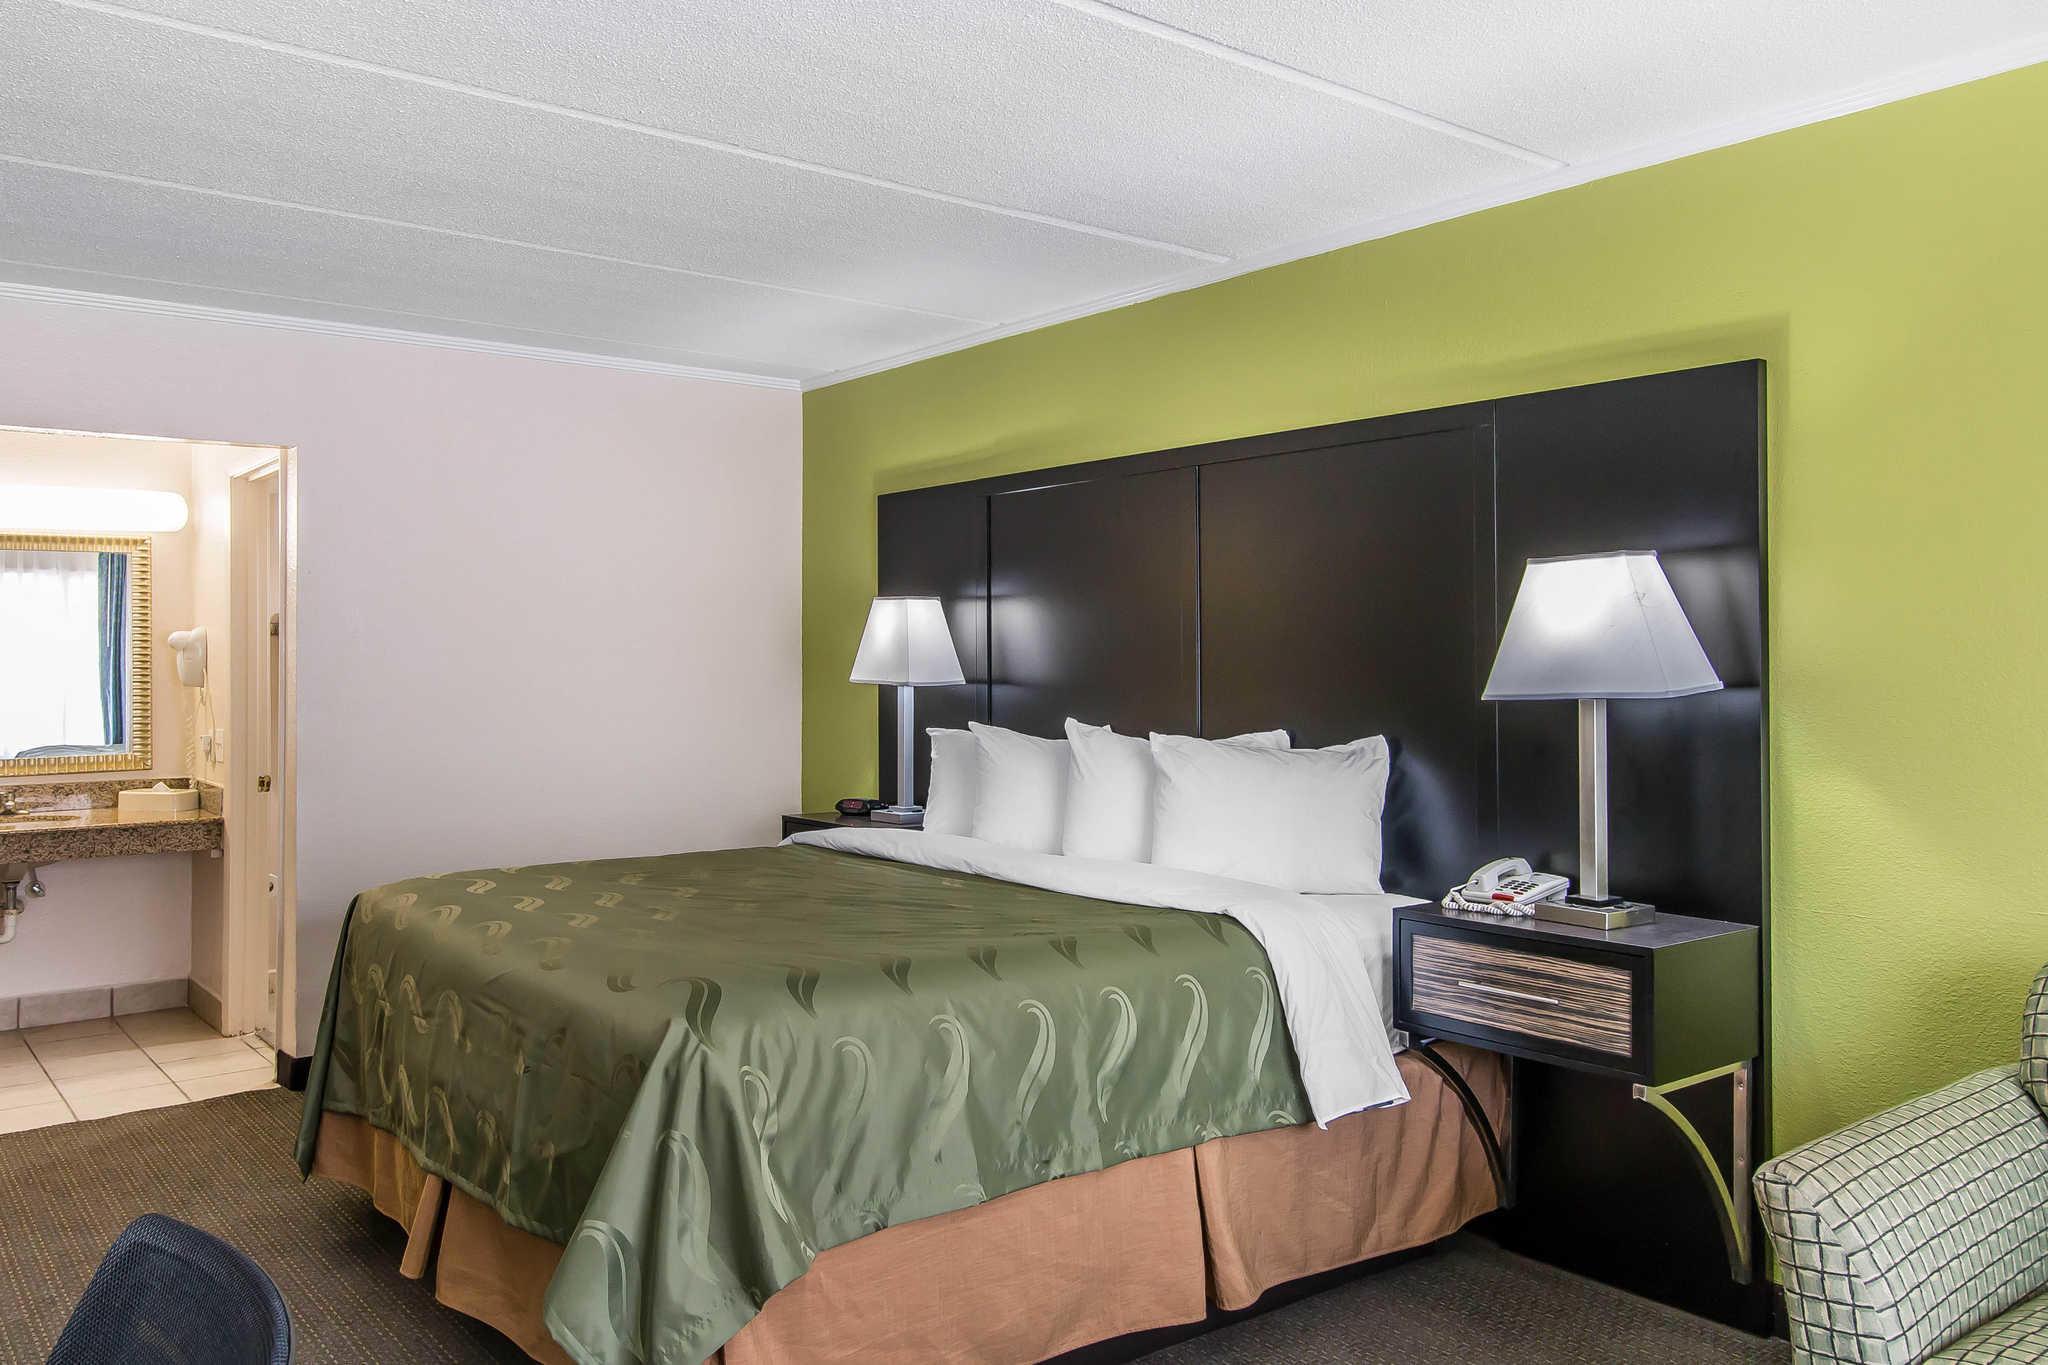 Quality Inn Hinesville - Fort Stewart Area image 12